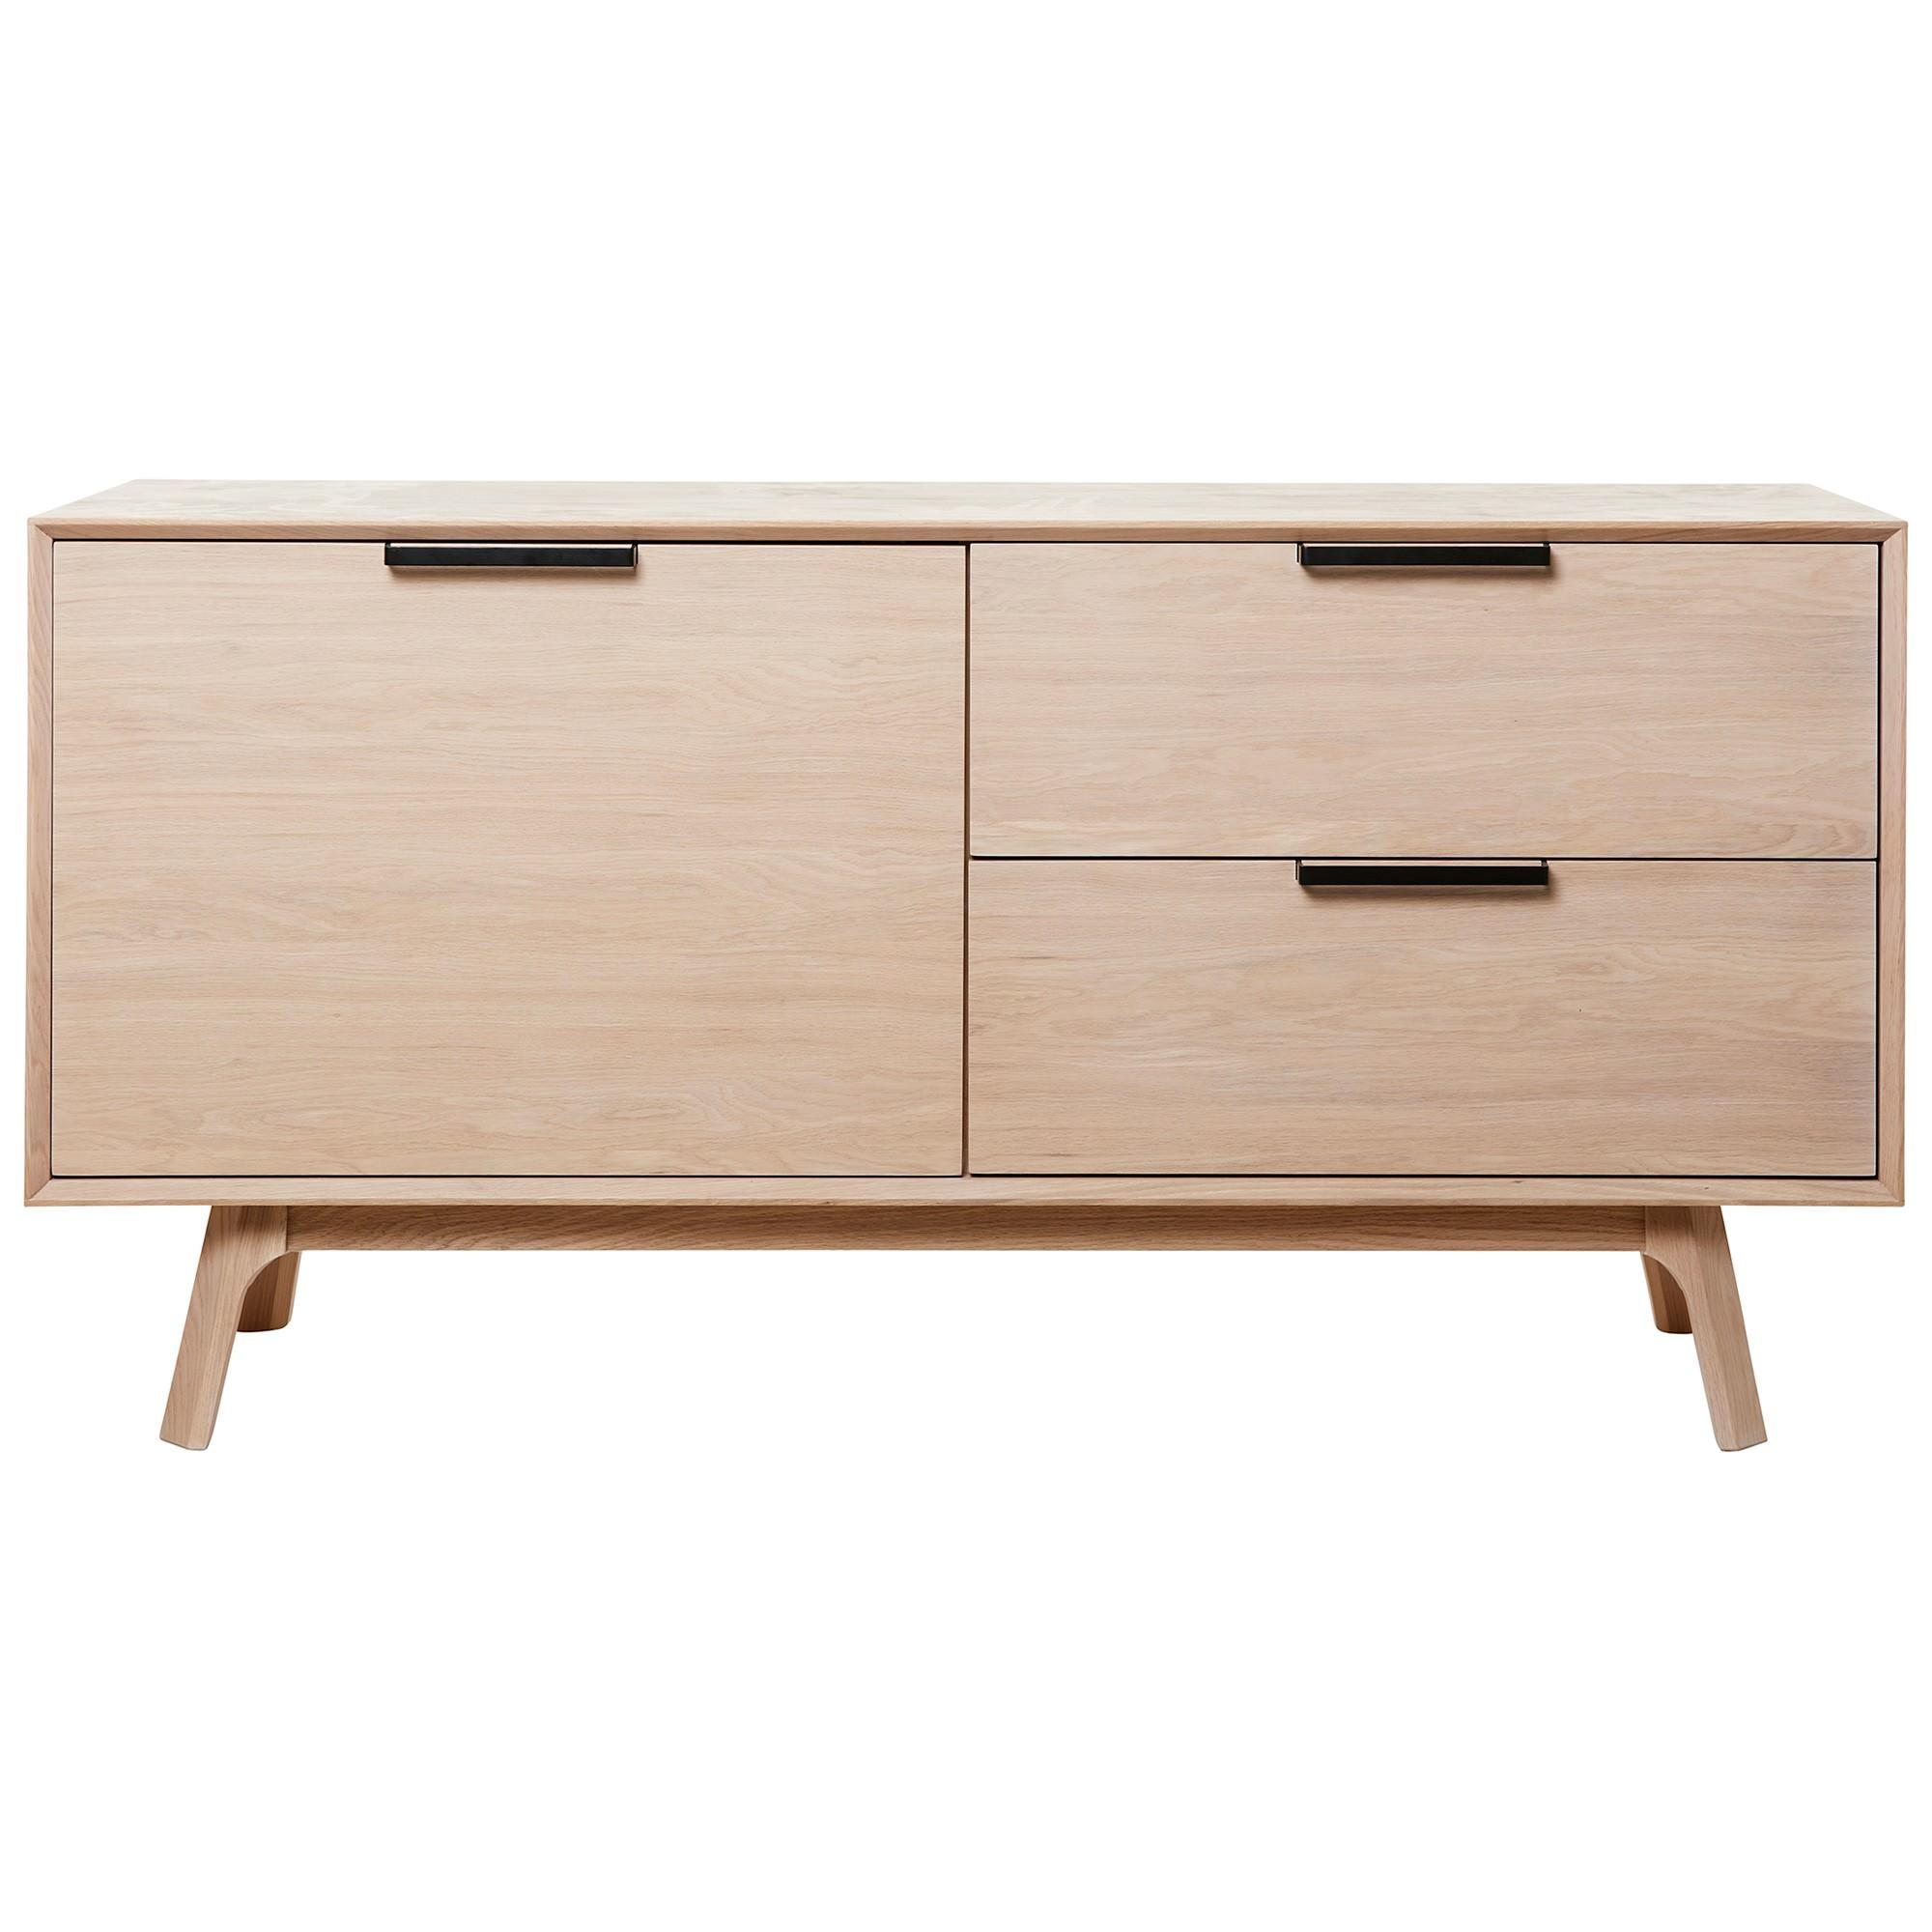 Capri White Oak Timber 1 Door 2 Drawer Sideboard, 150cm